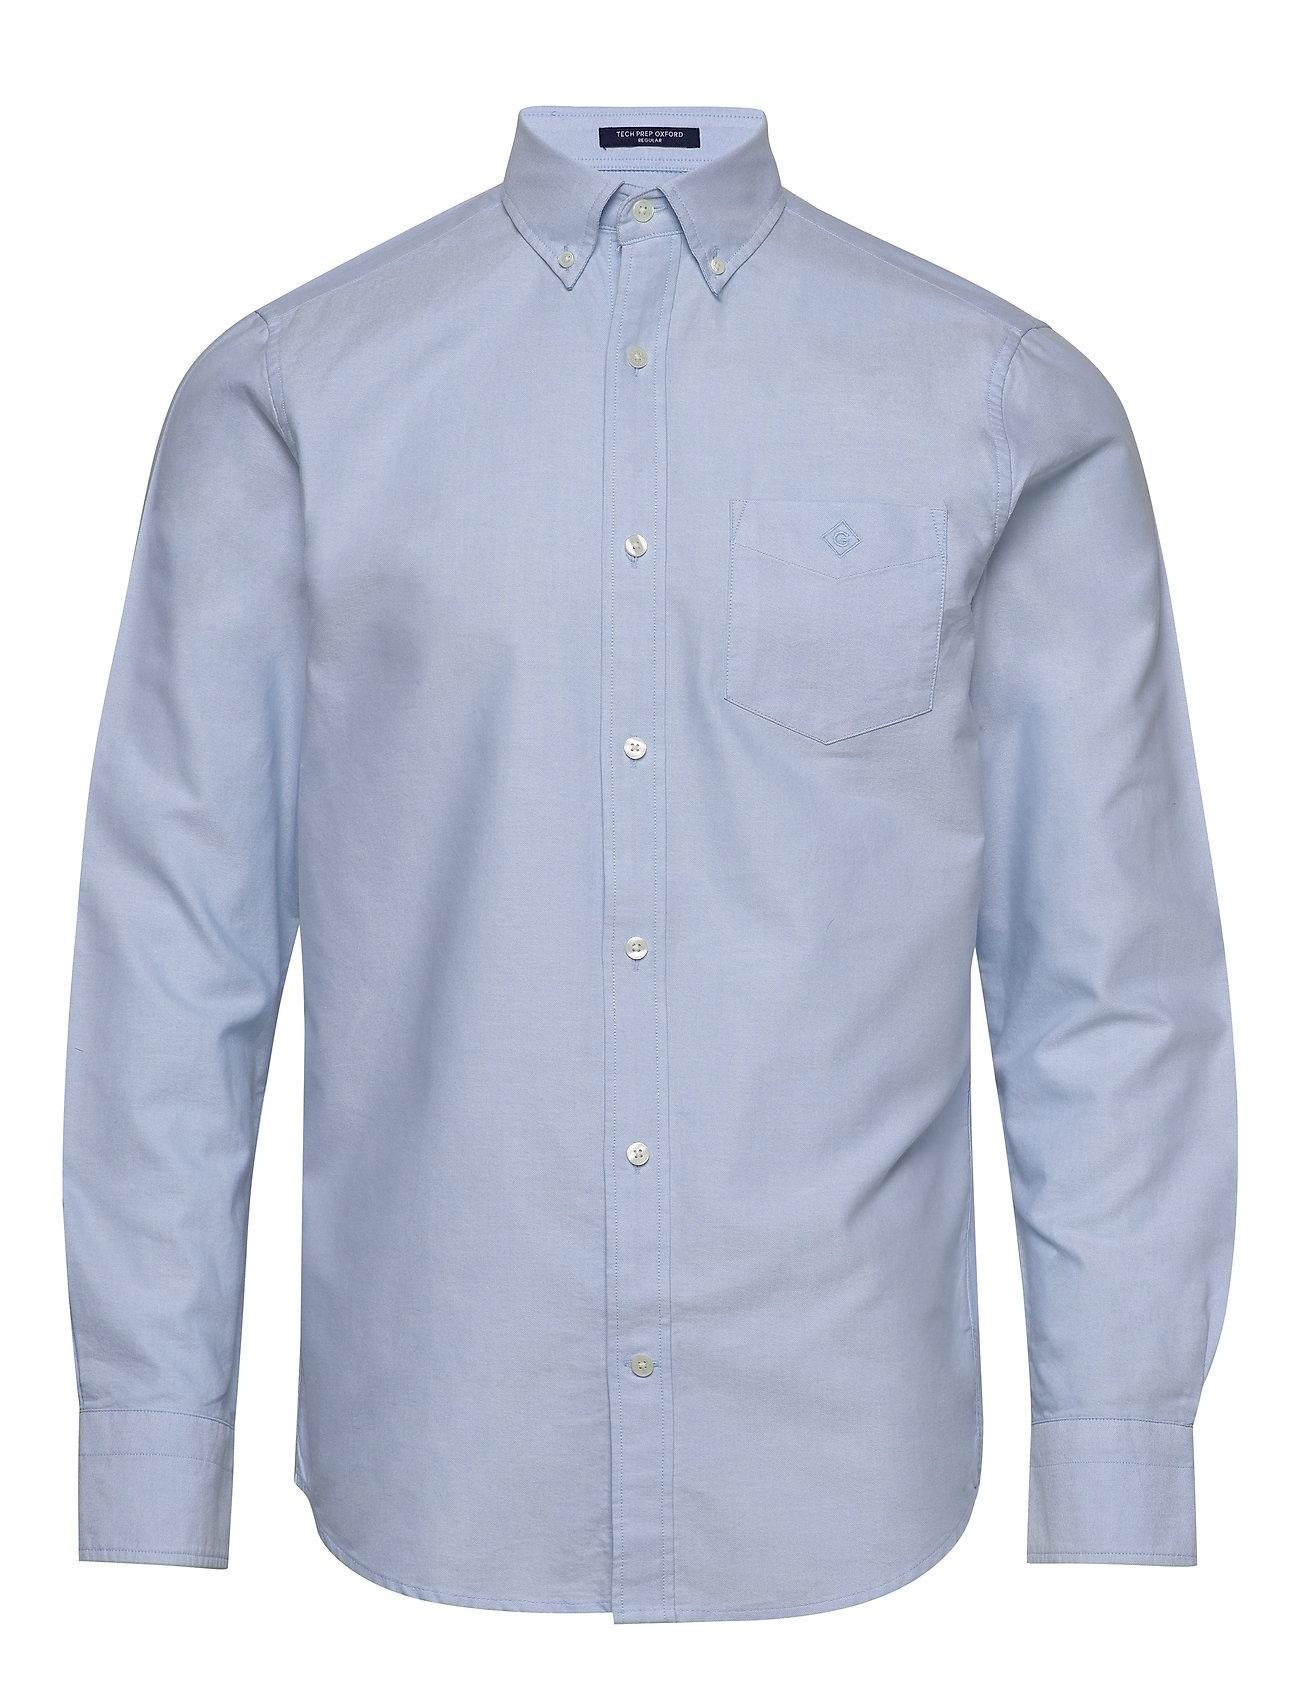 Gant D2. TP GBP OXFORD CHECK REG LBD - CAPRI BLUE